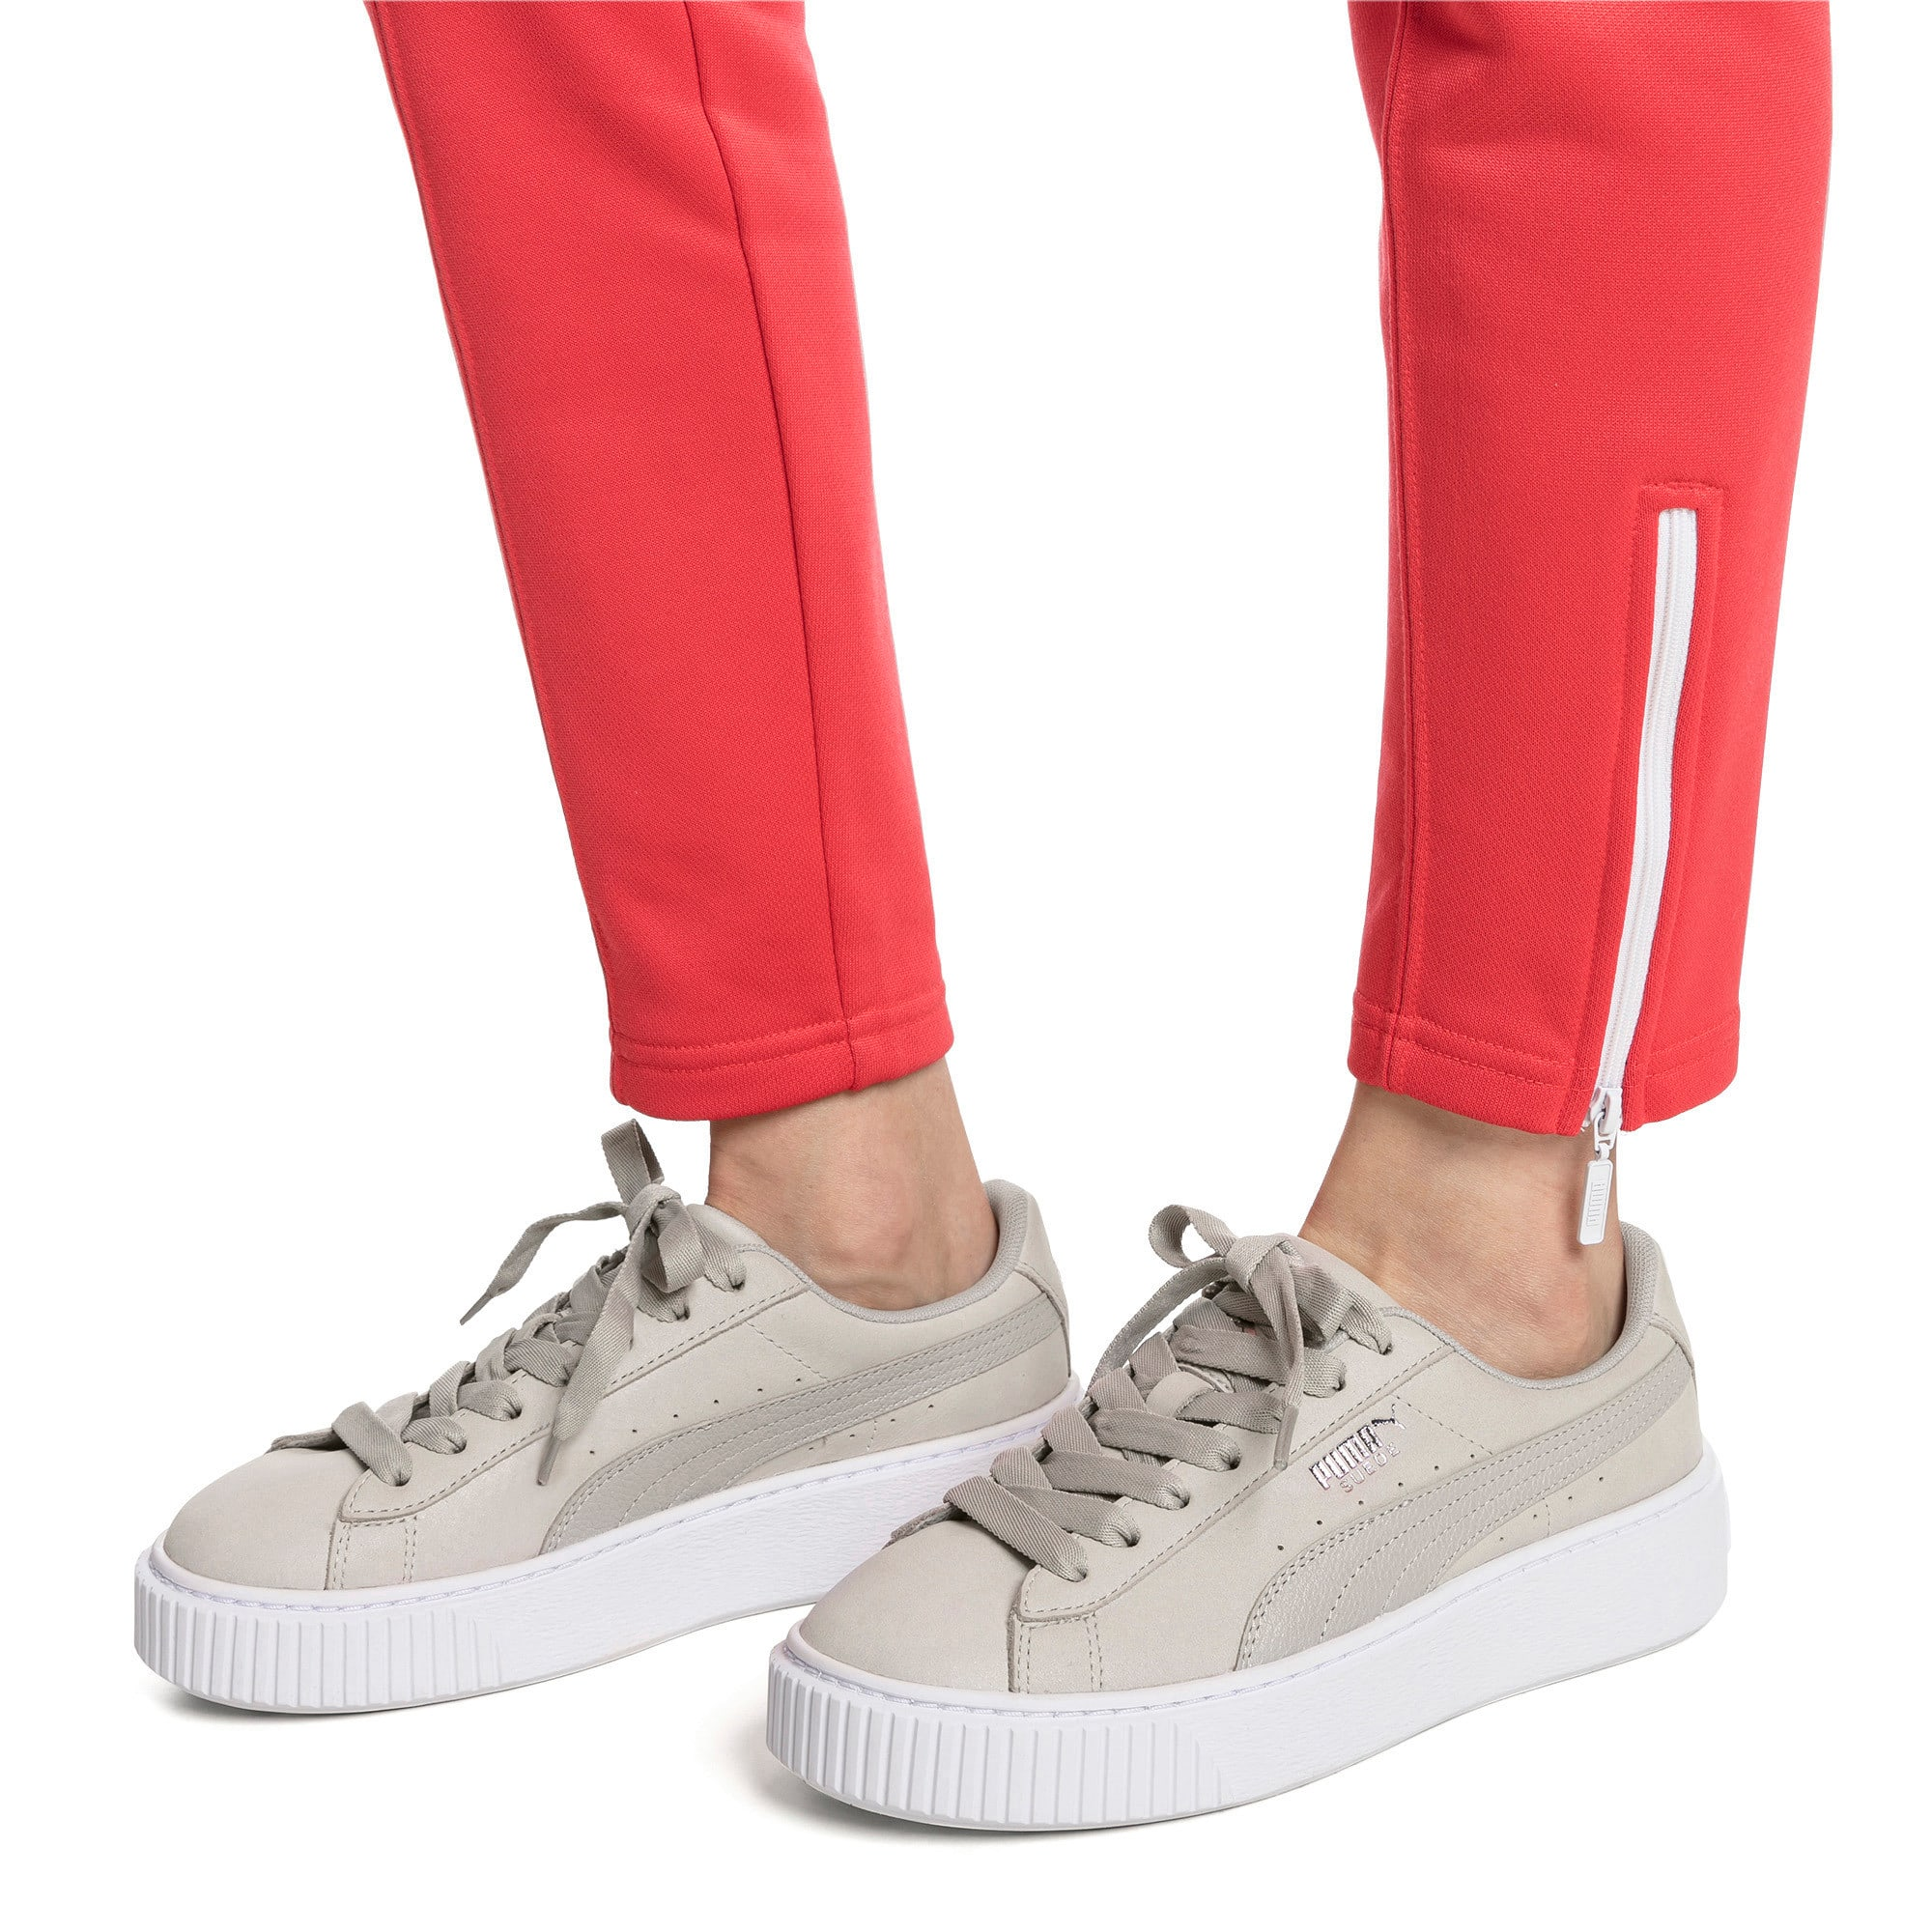 Thumbnail 2 of Suede Platform Shimmer Women's Sneakers, Gray Violet-Puma White, medium